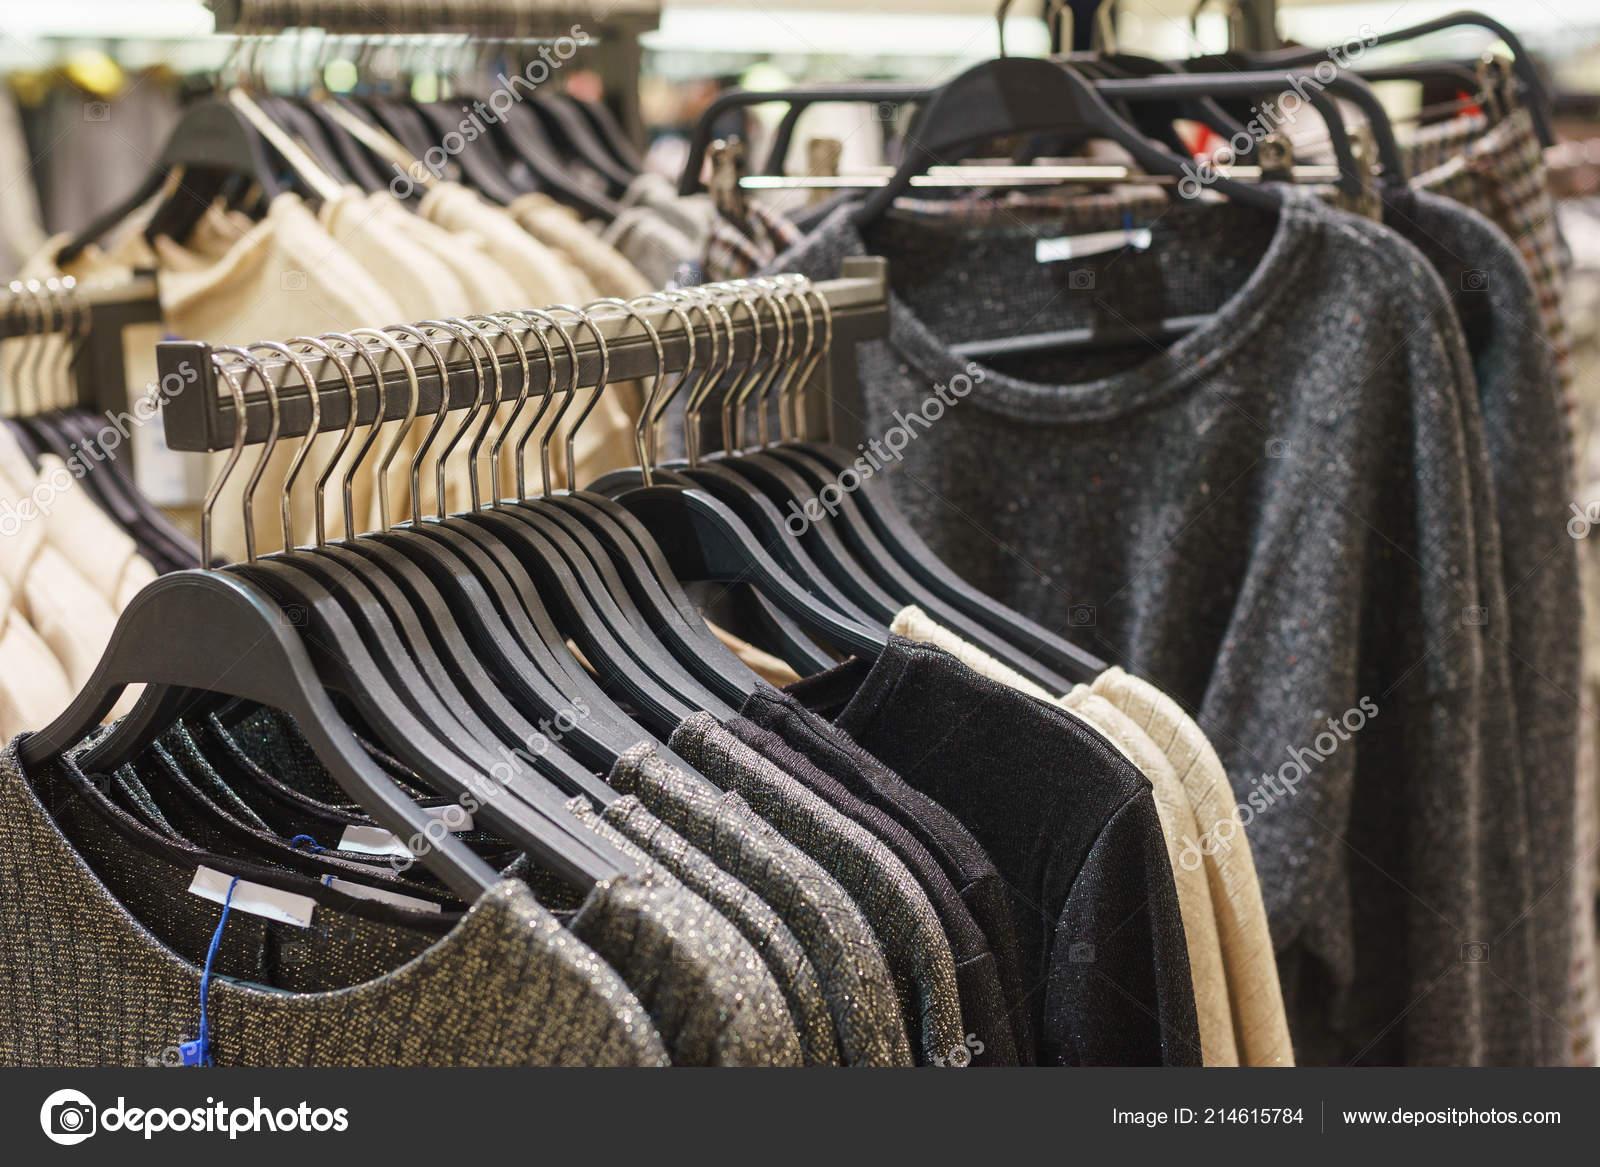 cb99843744 Μοντέρνα Αντρικά και γυναικεία ρούχα στις ξύλινες κρεμάστρες σε ένα  κατάστημα για μοντέρνα ρούχα — Φωτογραφία